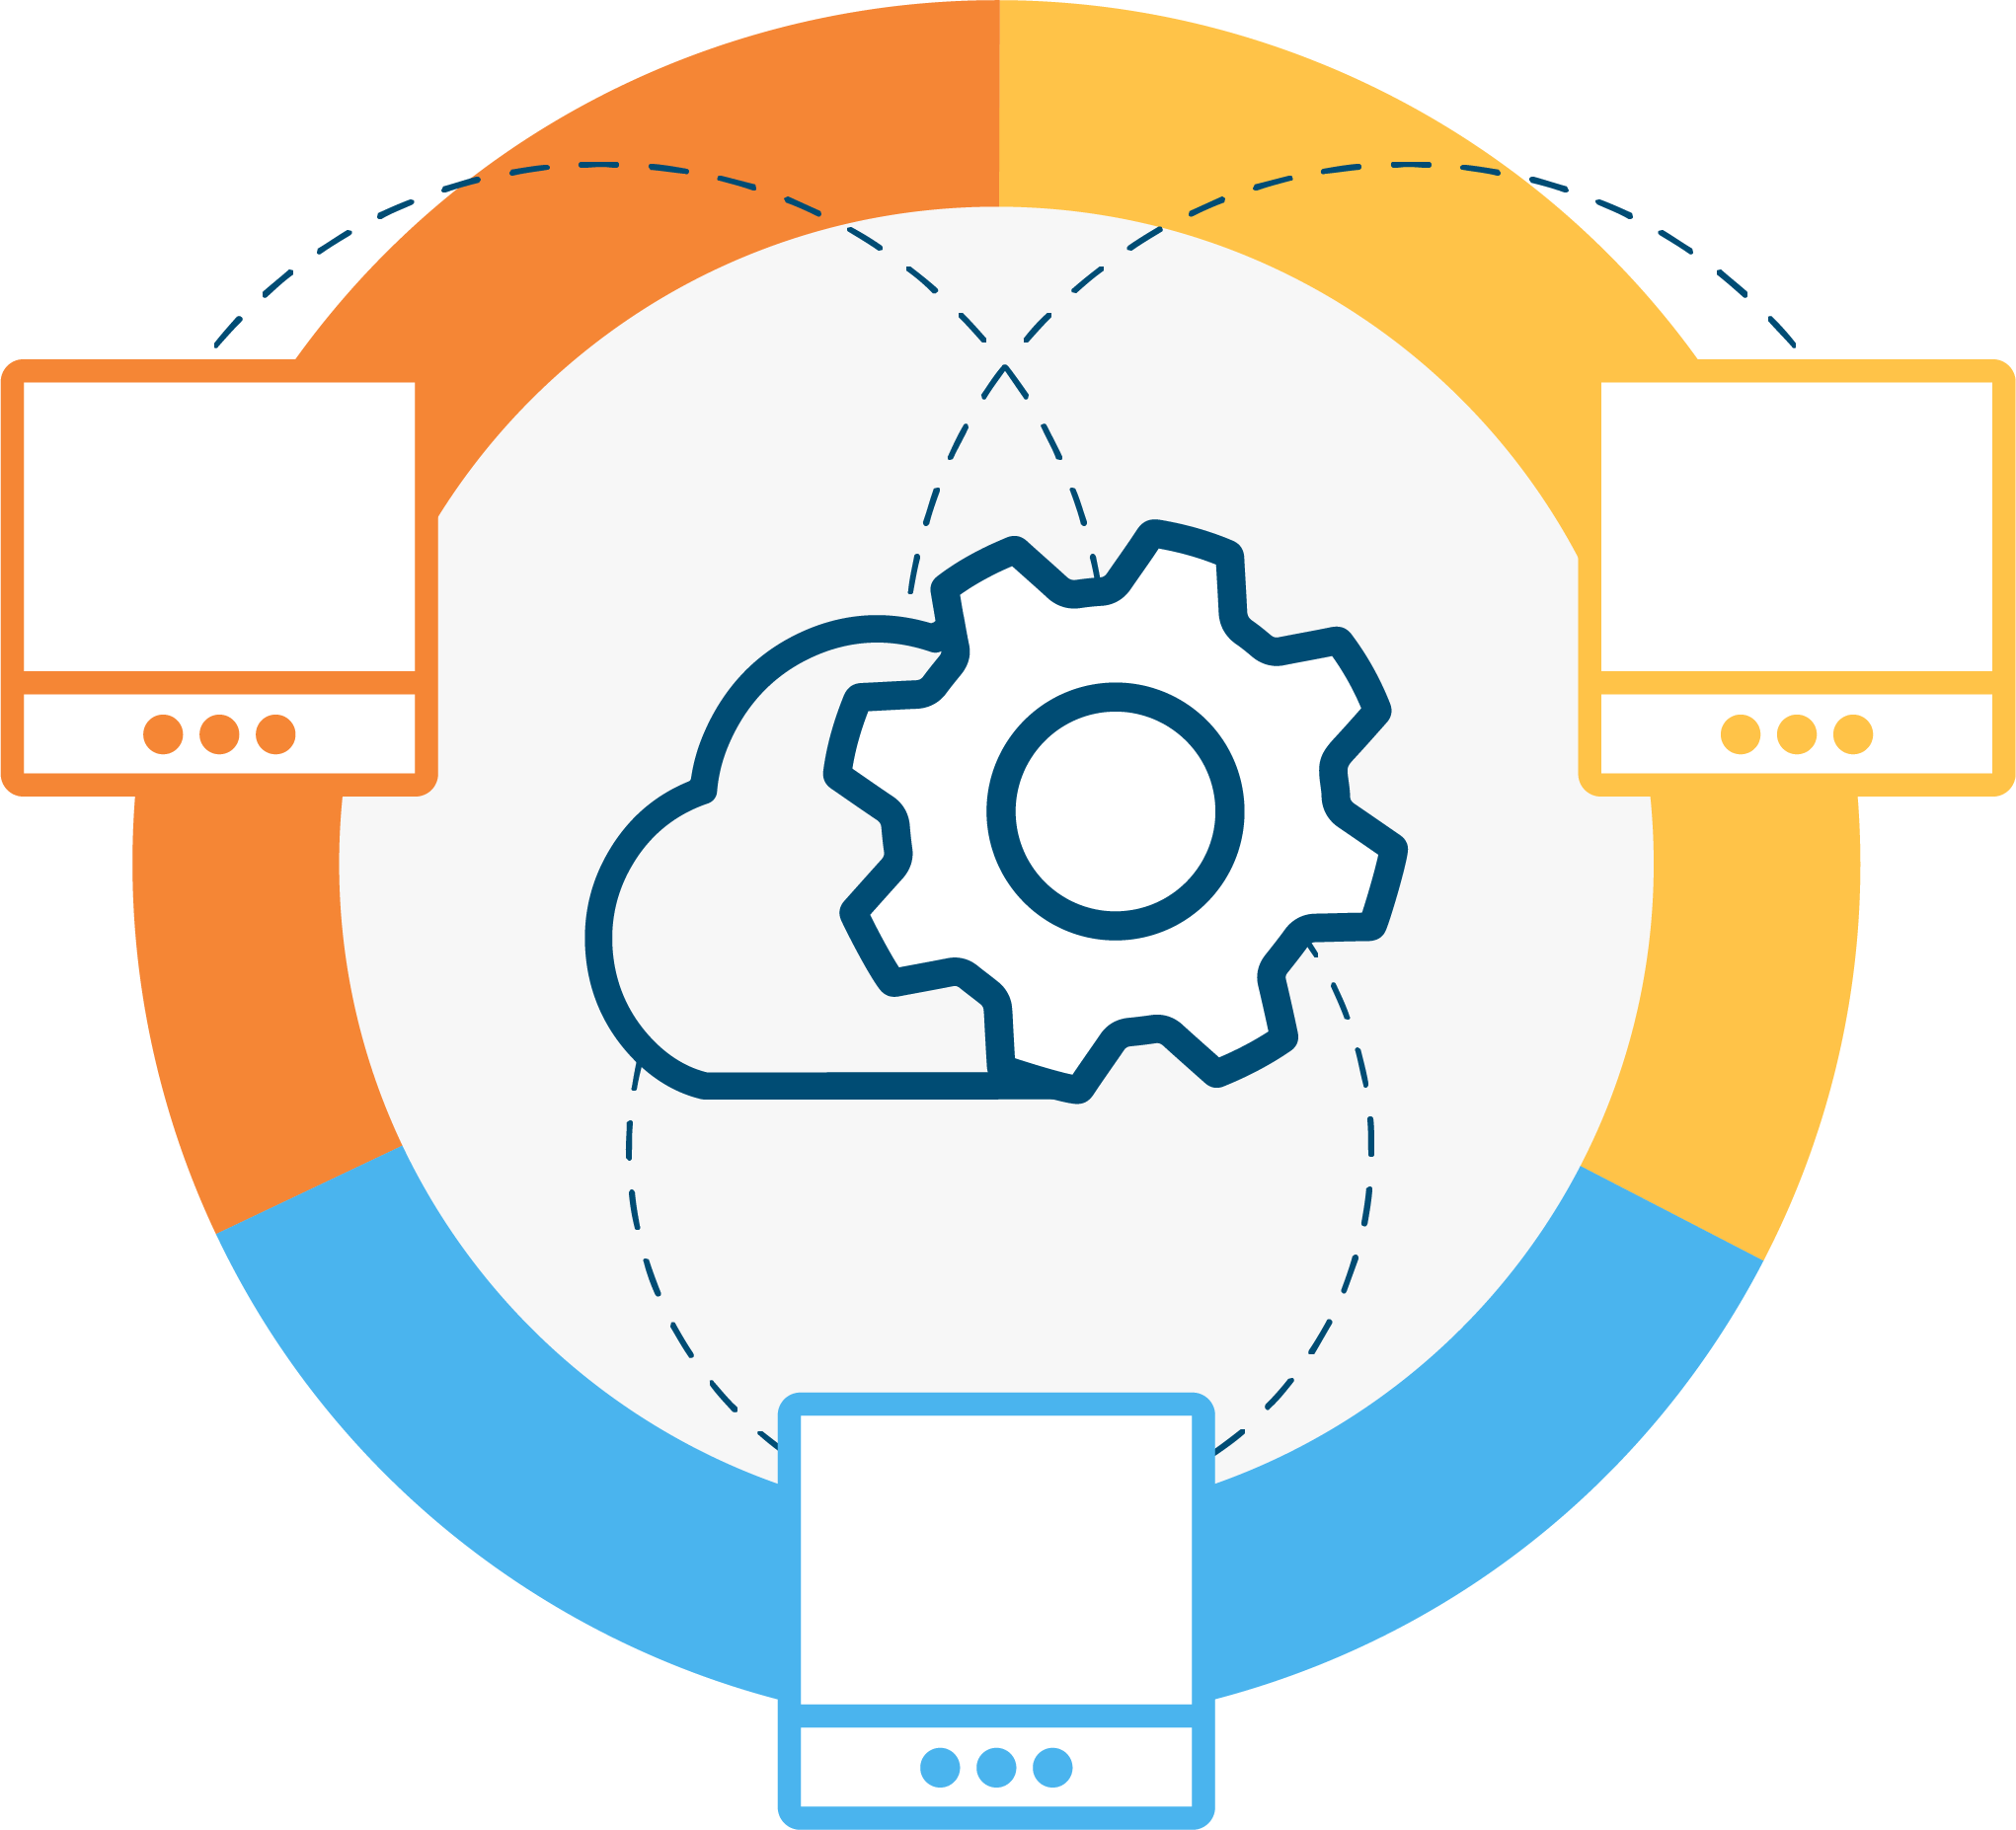 Application-OS-cloud-agnostic-solution-2.png